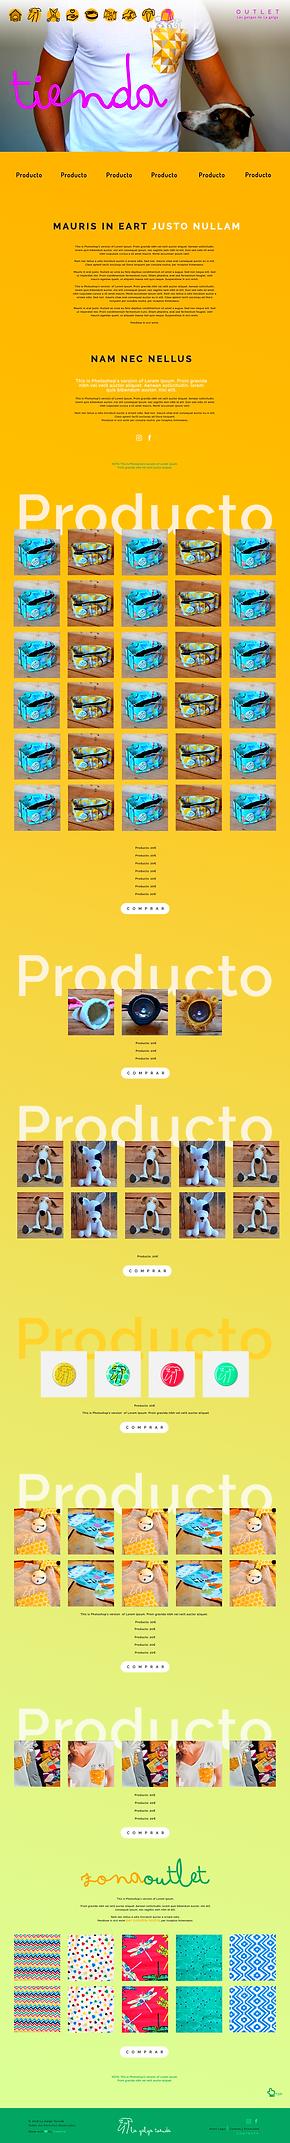 tienda_desktop.png